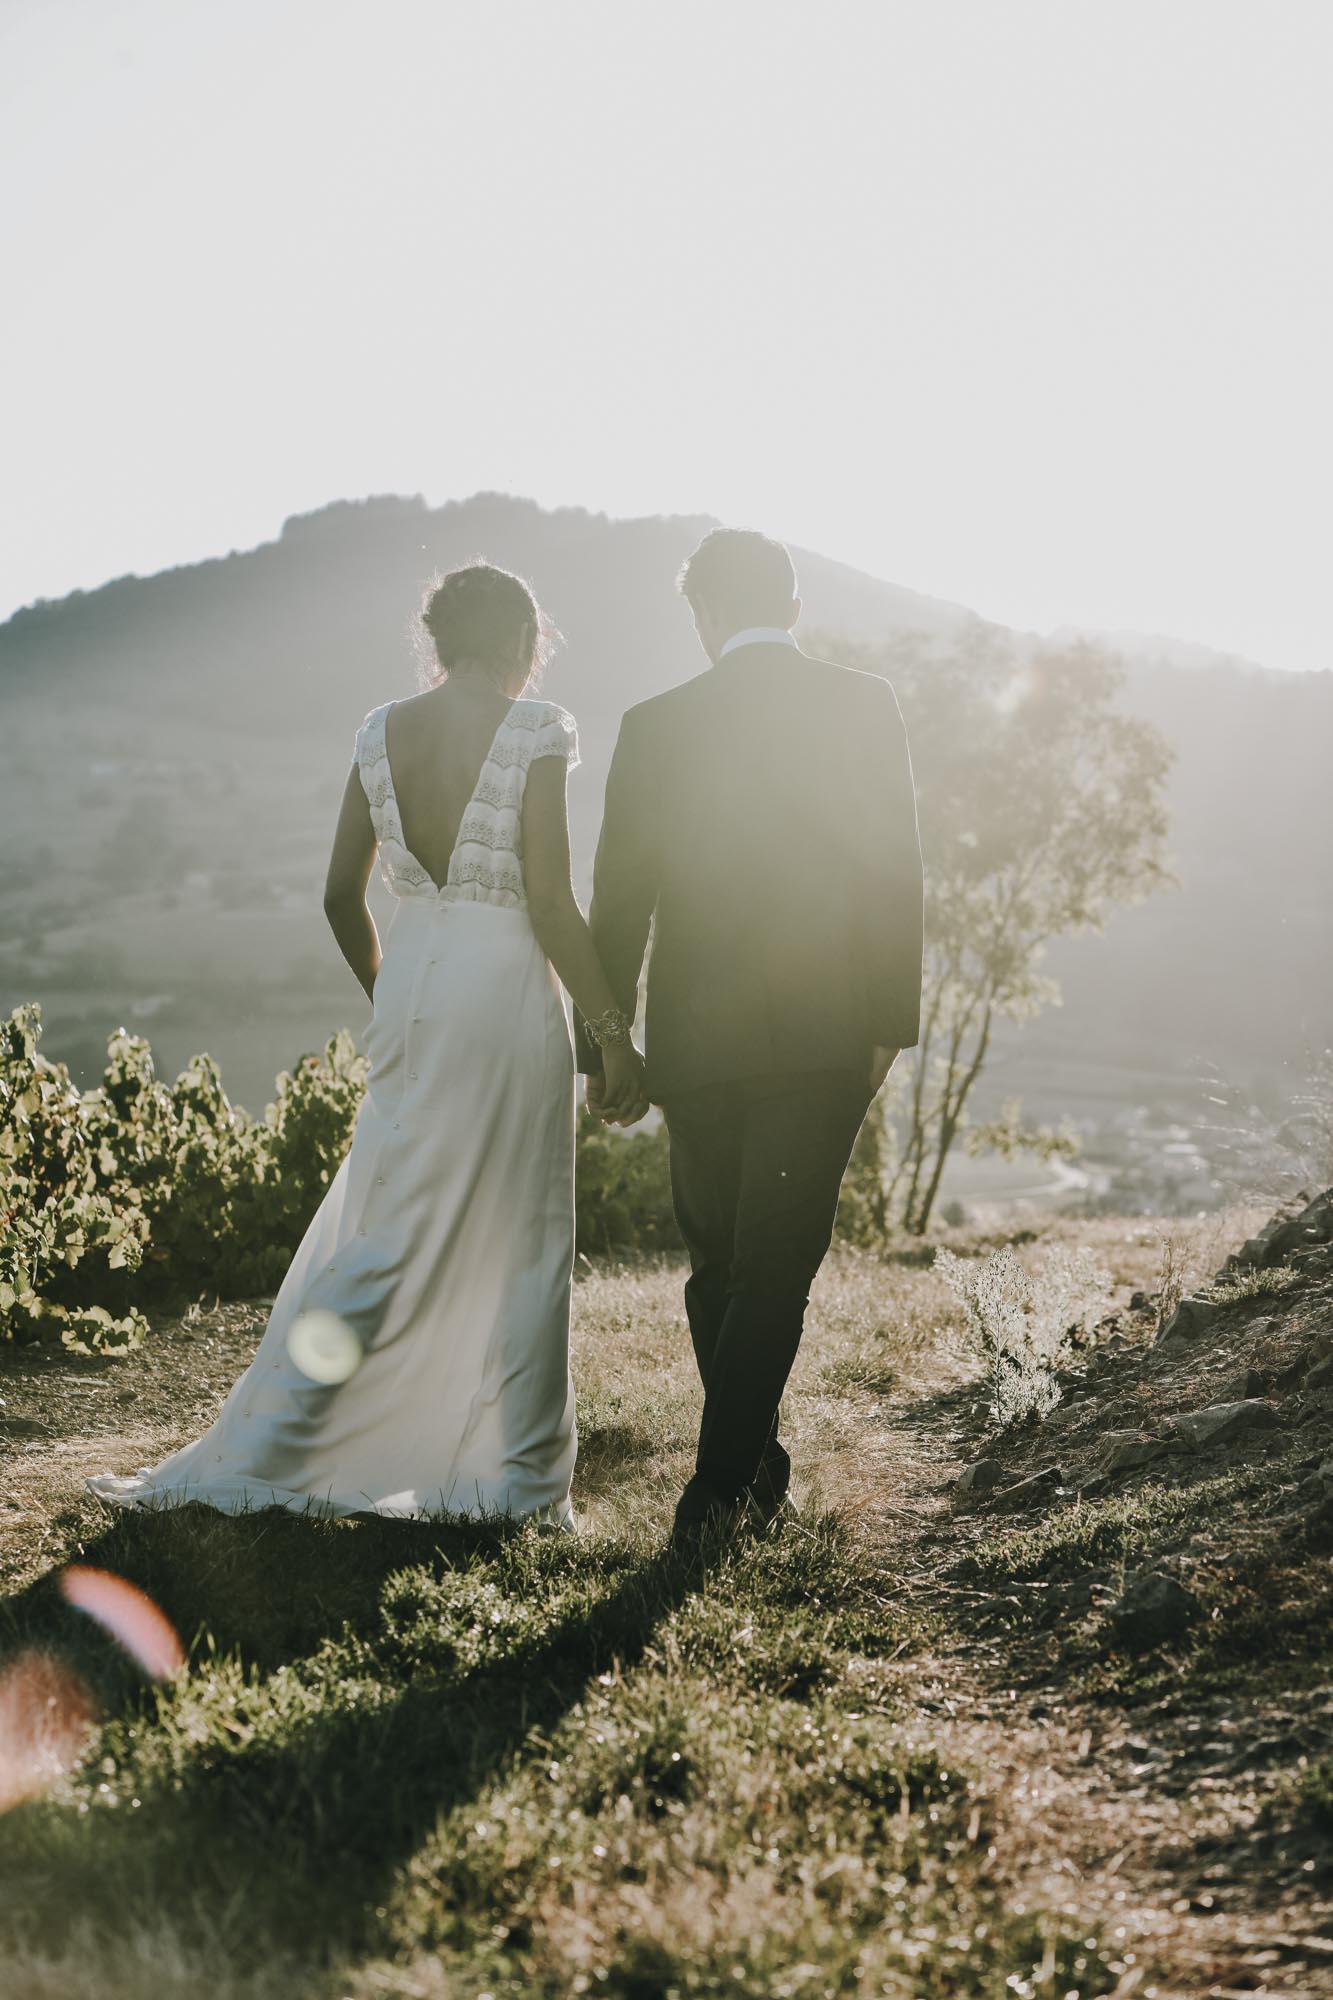 2018-09-08 - LD8_6096 - photographe mariage lyon - laurie diaz - www.lauriediazweeding.com.jpg